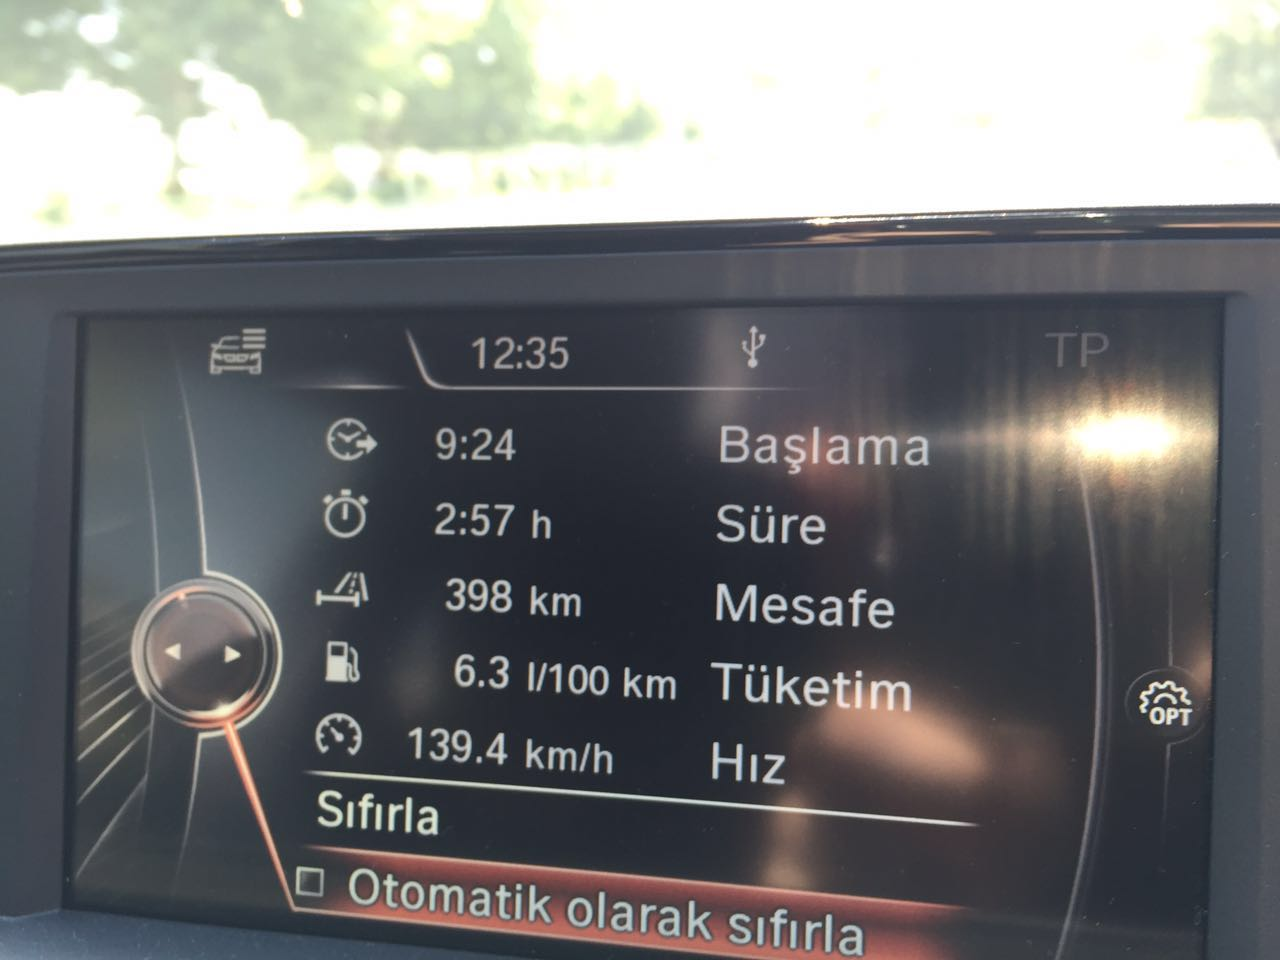 bmw 116d otomatik yakıt tüketimipage 1 of 4